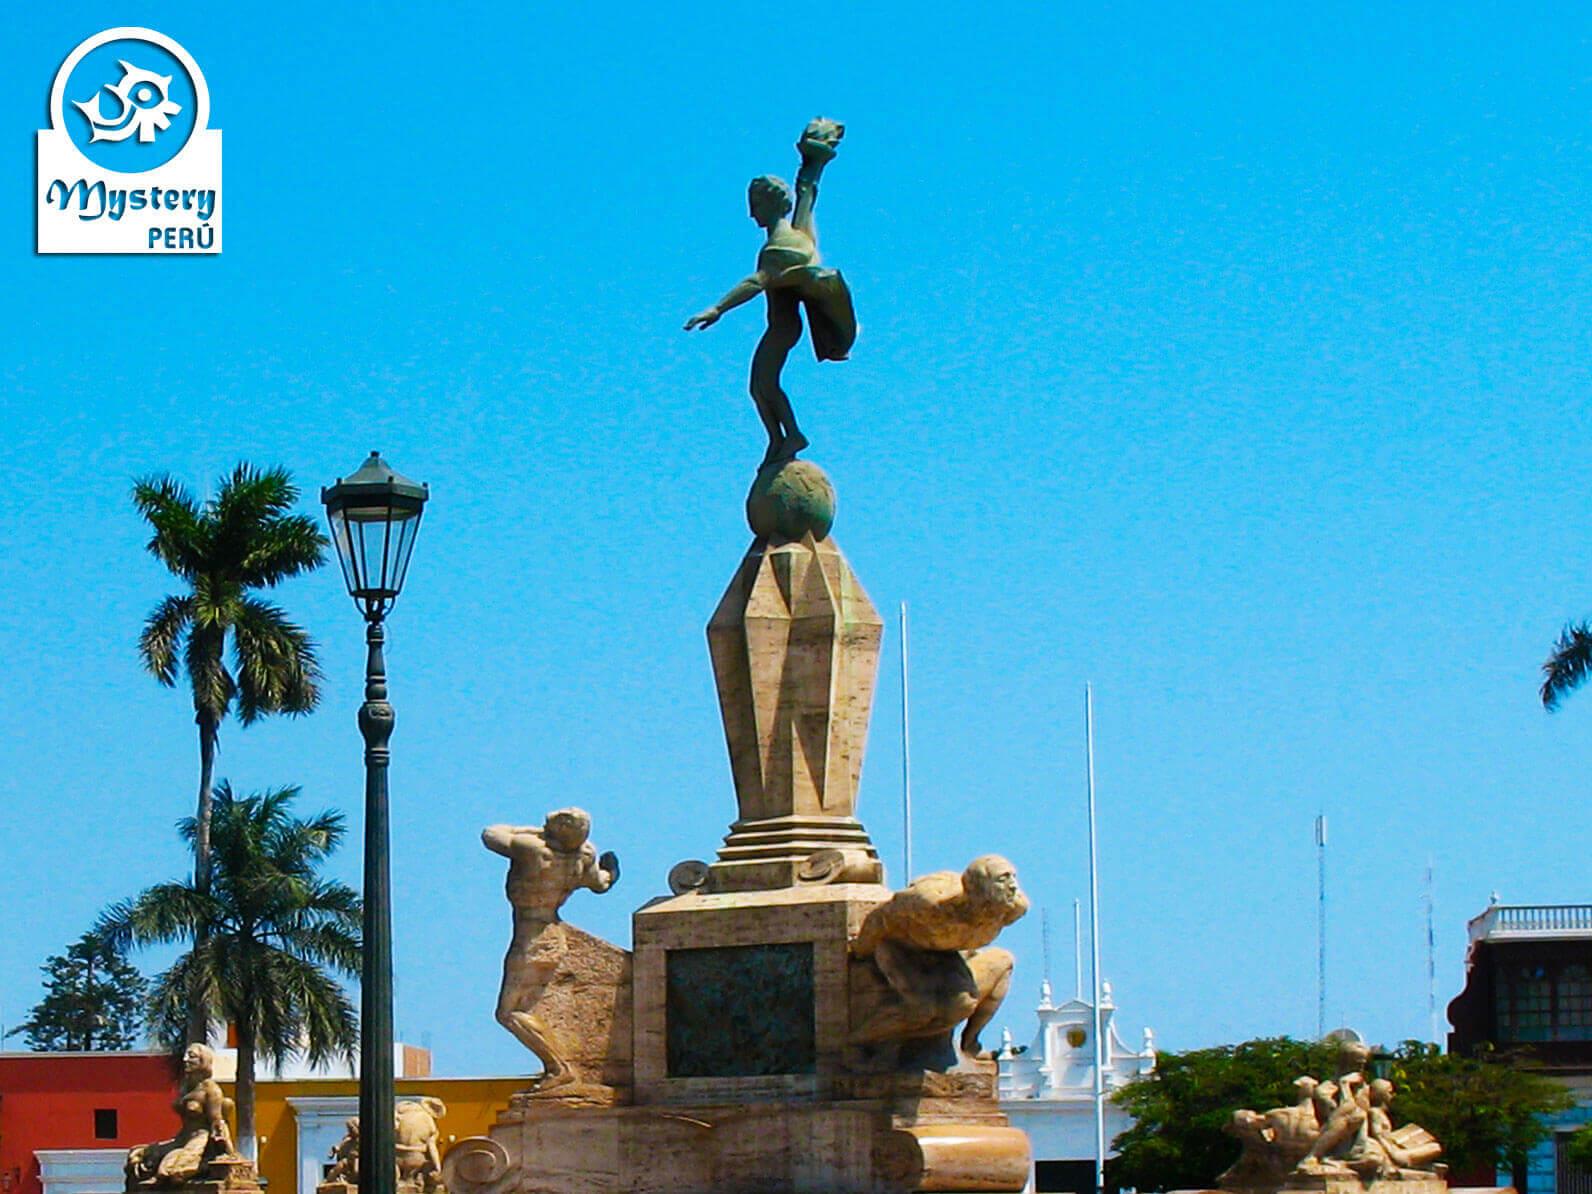 Monument of freedom in Trujillo Peru